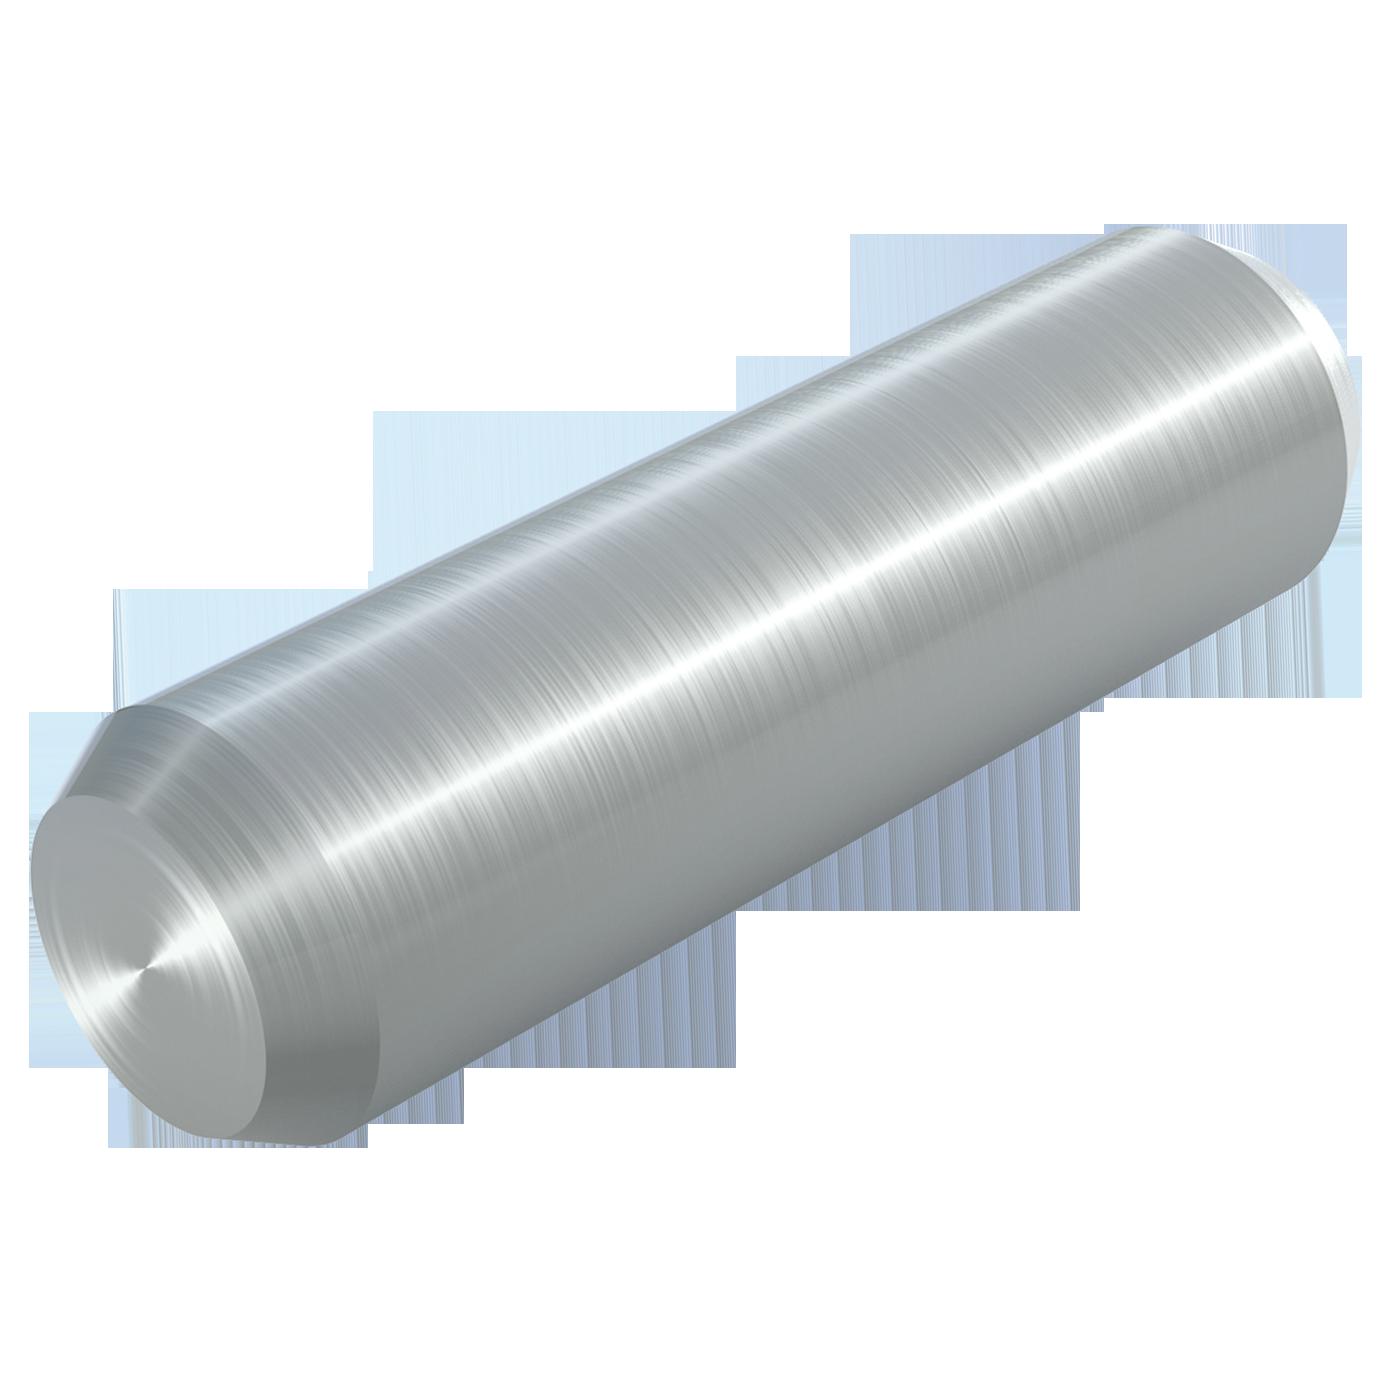 Bolzen DIN 1433 Form A